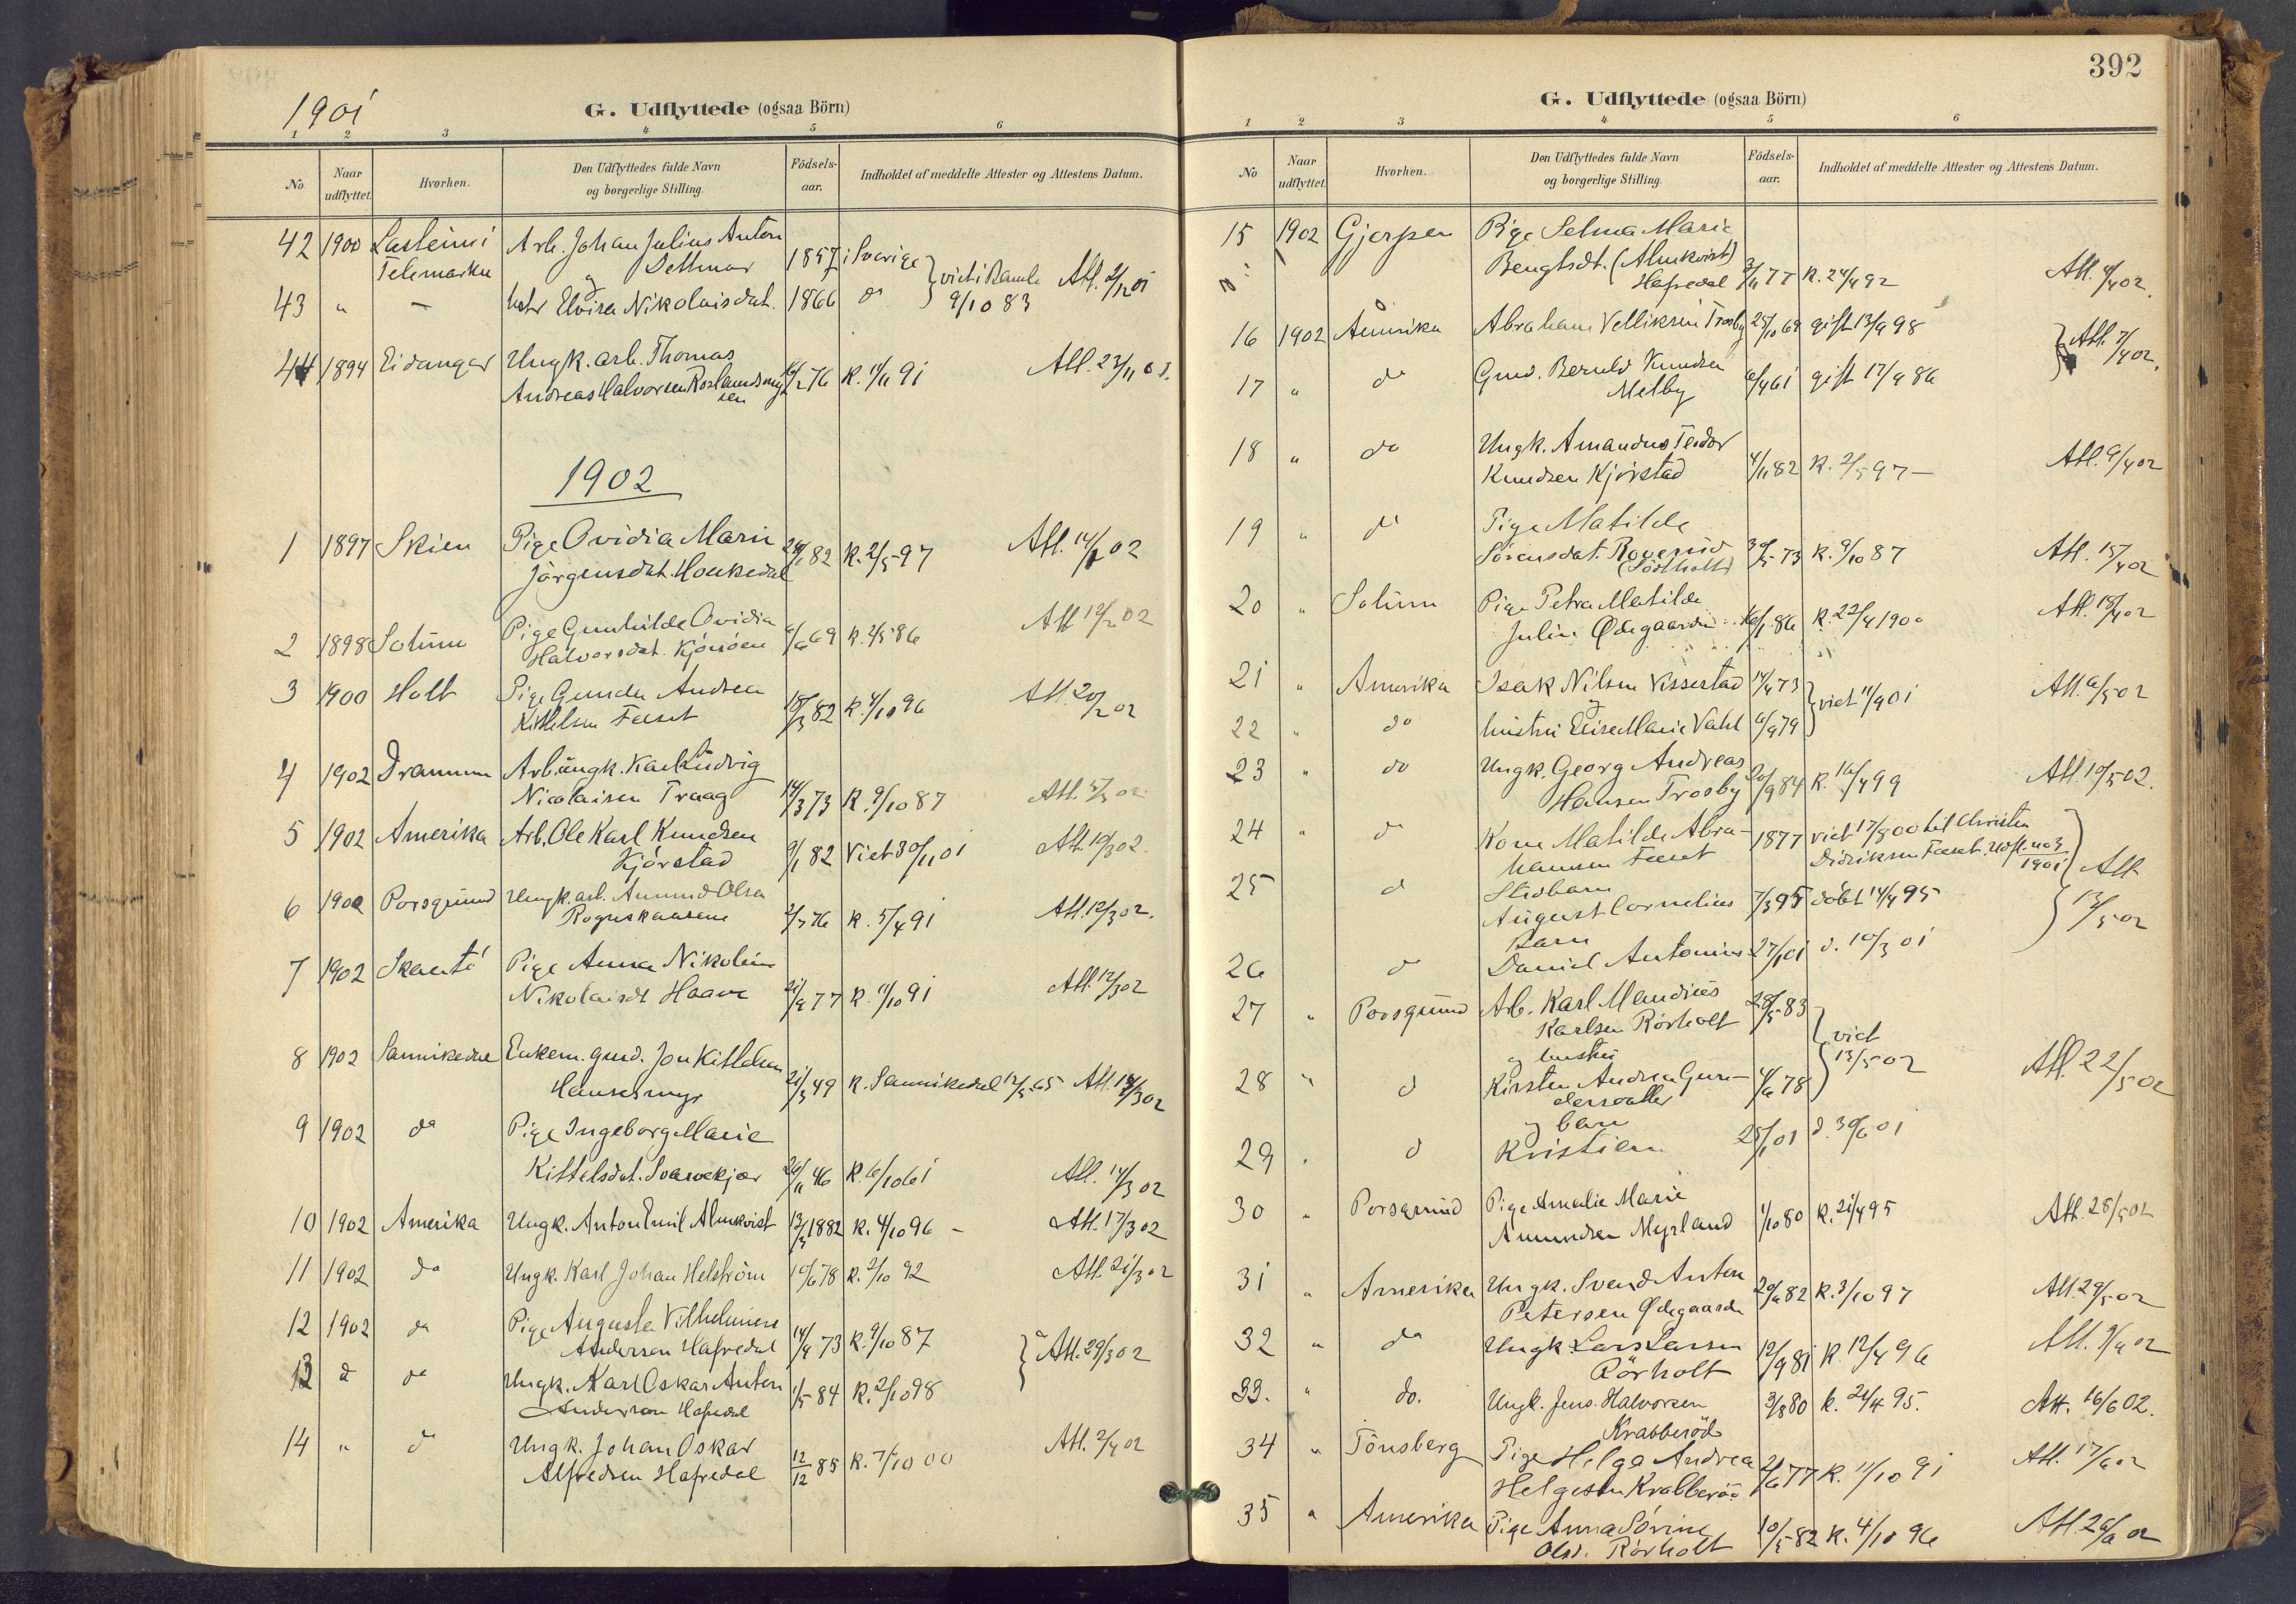 SAKO, Bamble kirkebøker, F/Fa/L0009: Ministerialbok nr. I 9, 1901-1917, s. 392